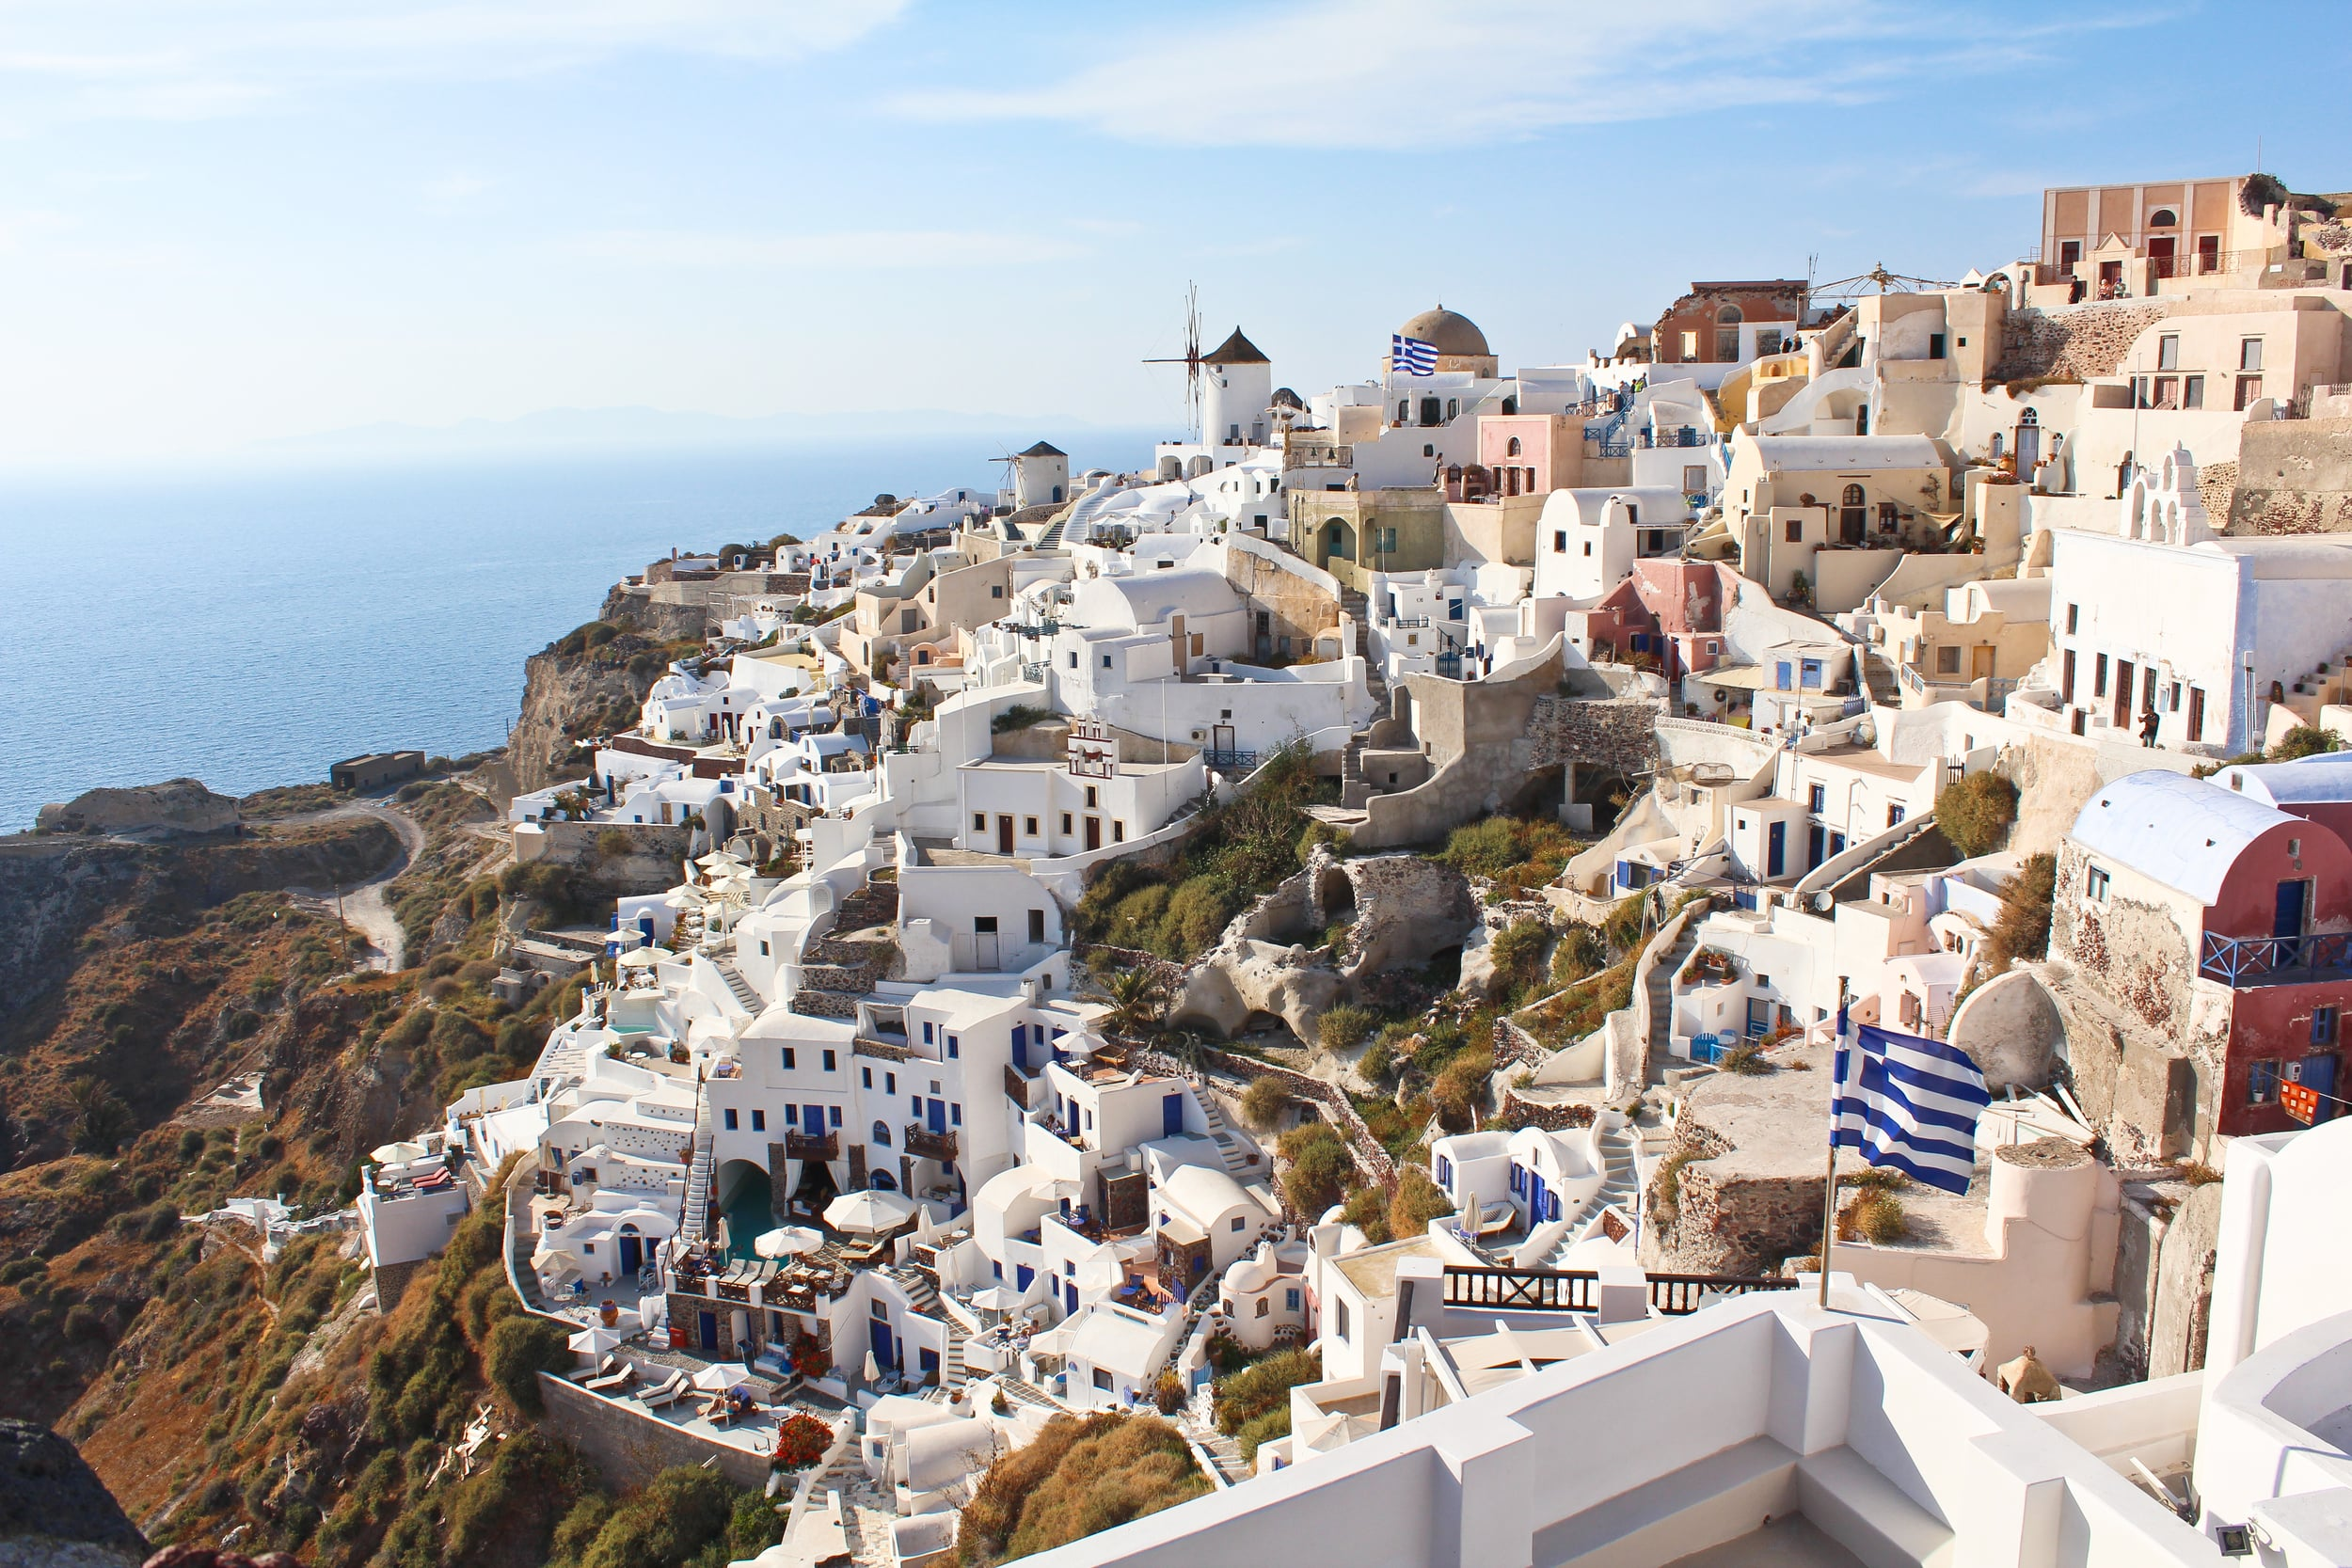 trisa-taro-town-cliffside-oia-santorini-greece.jpg